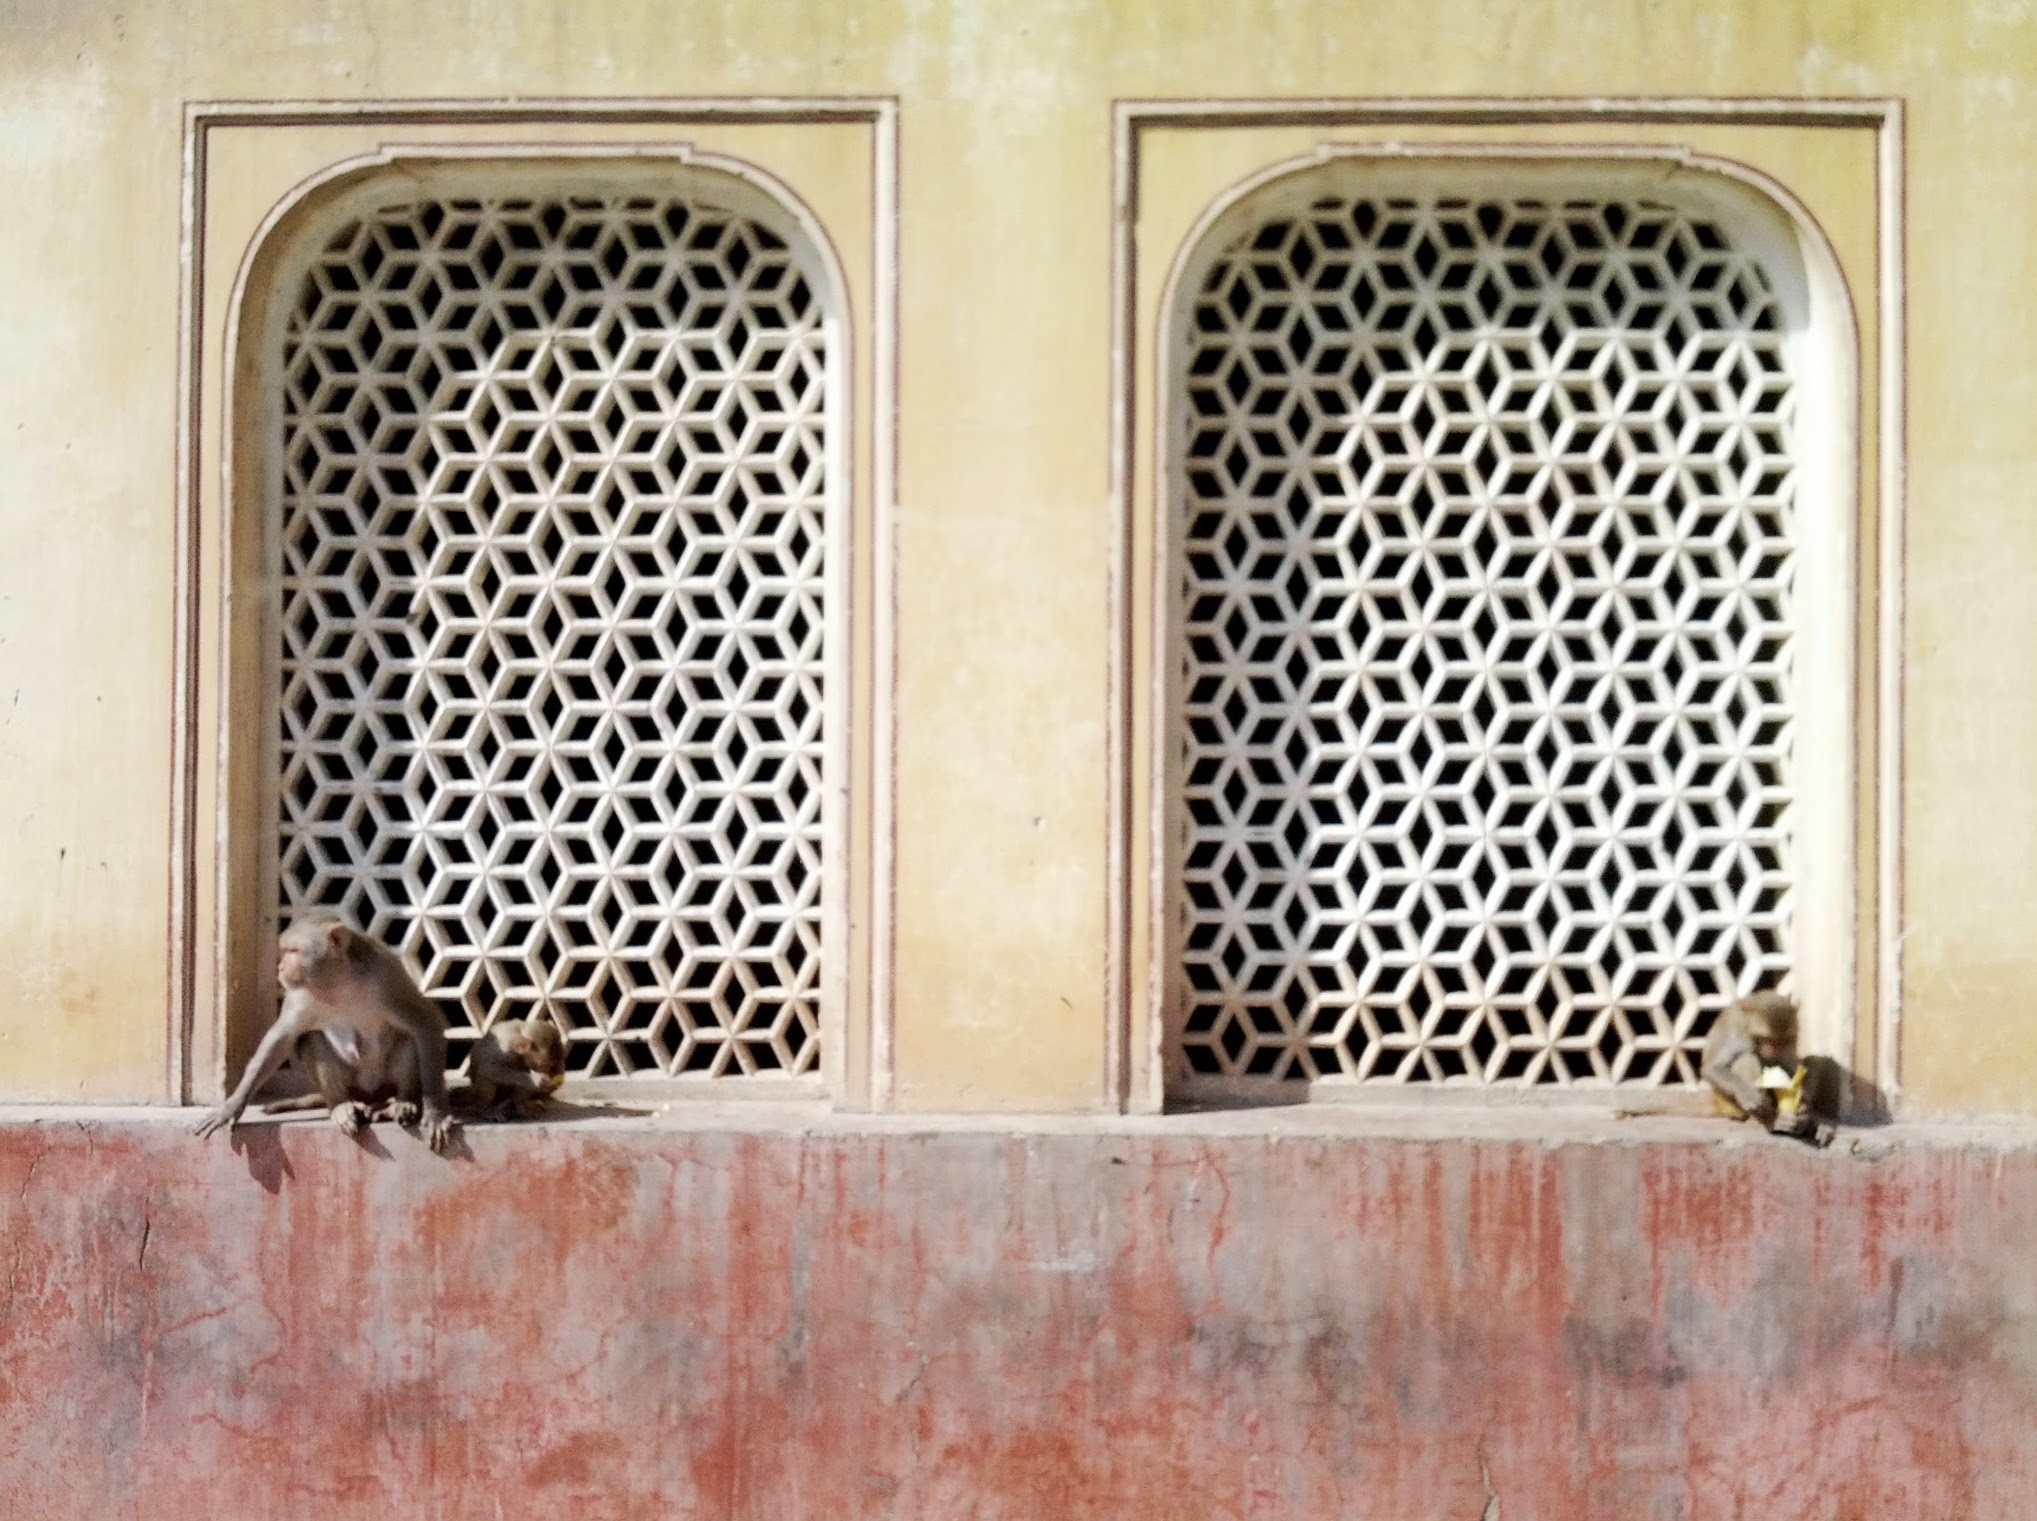 Galwar Bagh (Monkey Temple), Jaipur